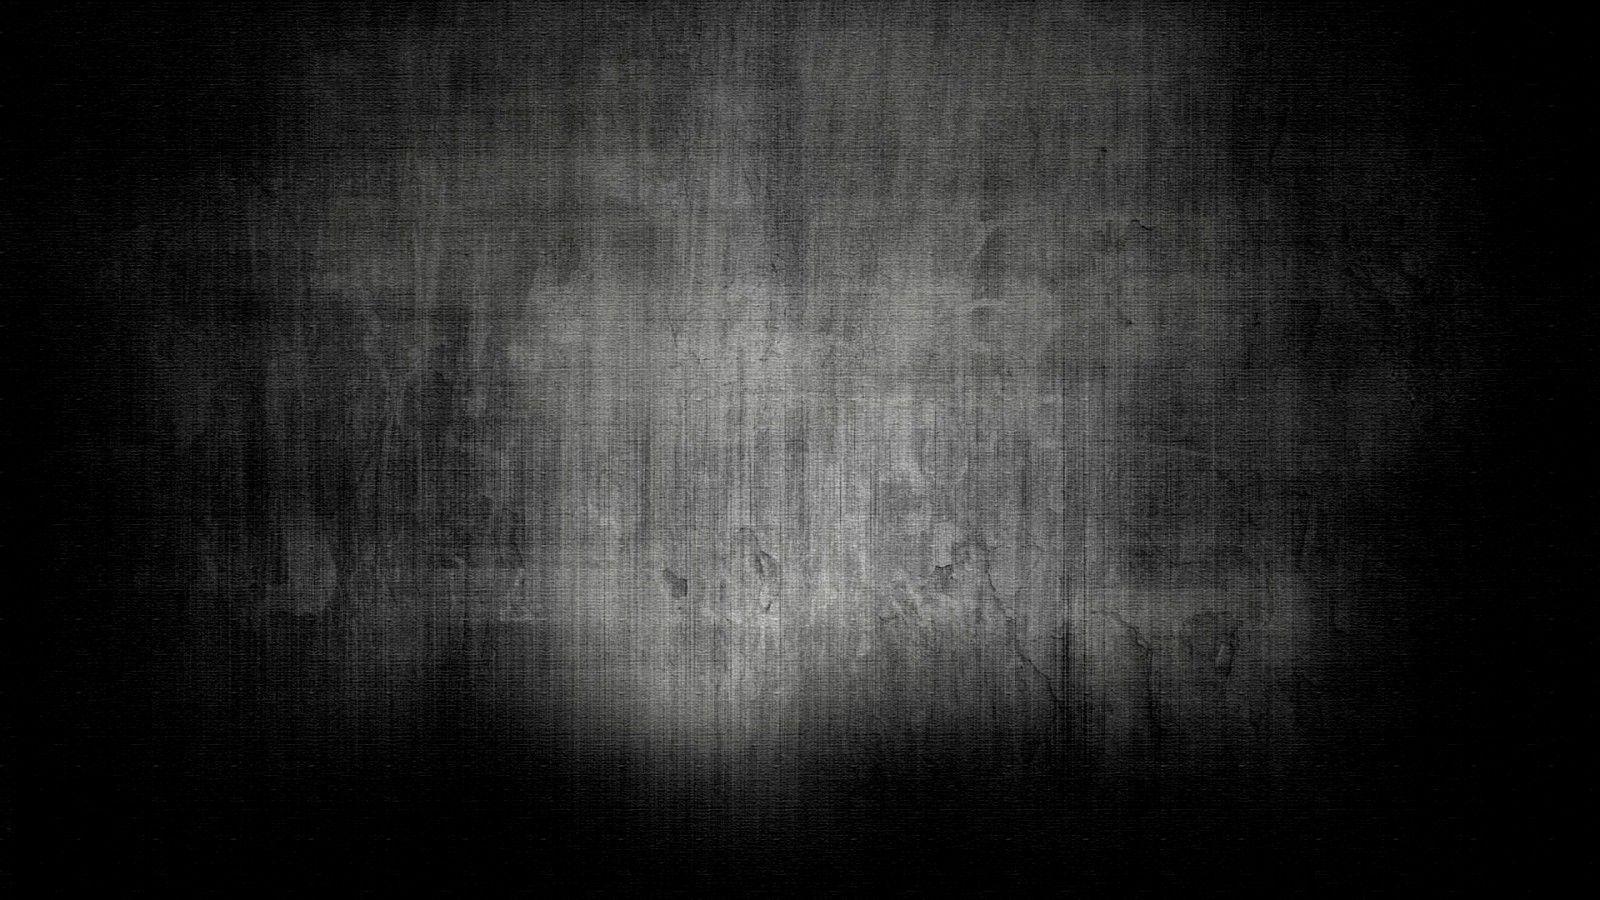 Black Backgrounds HD - Wallpaper Cave